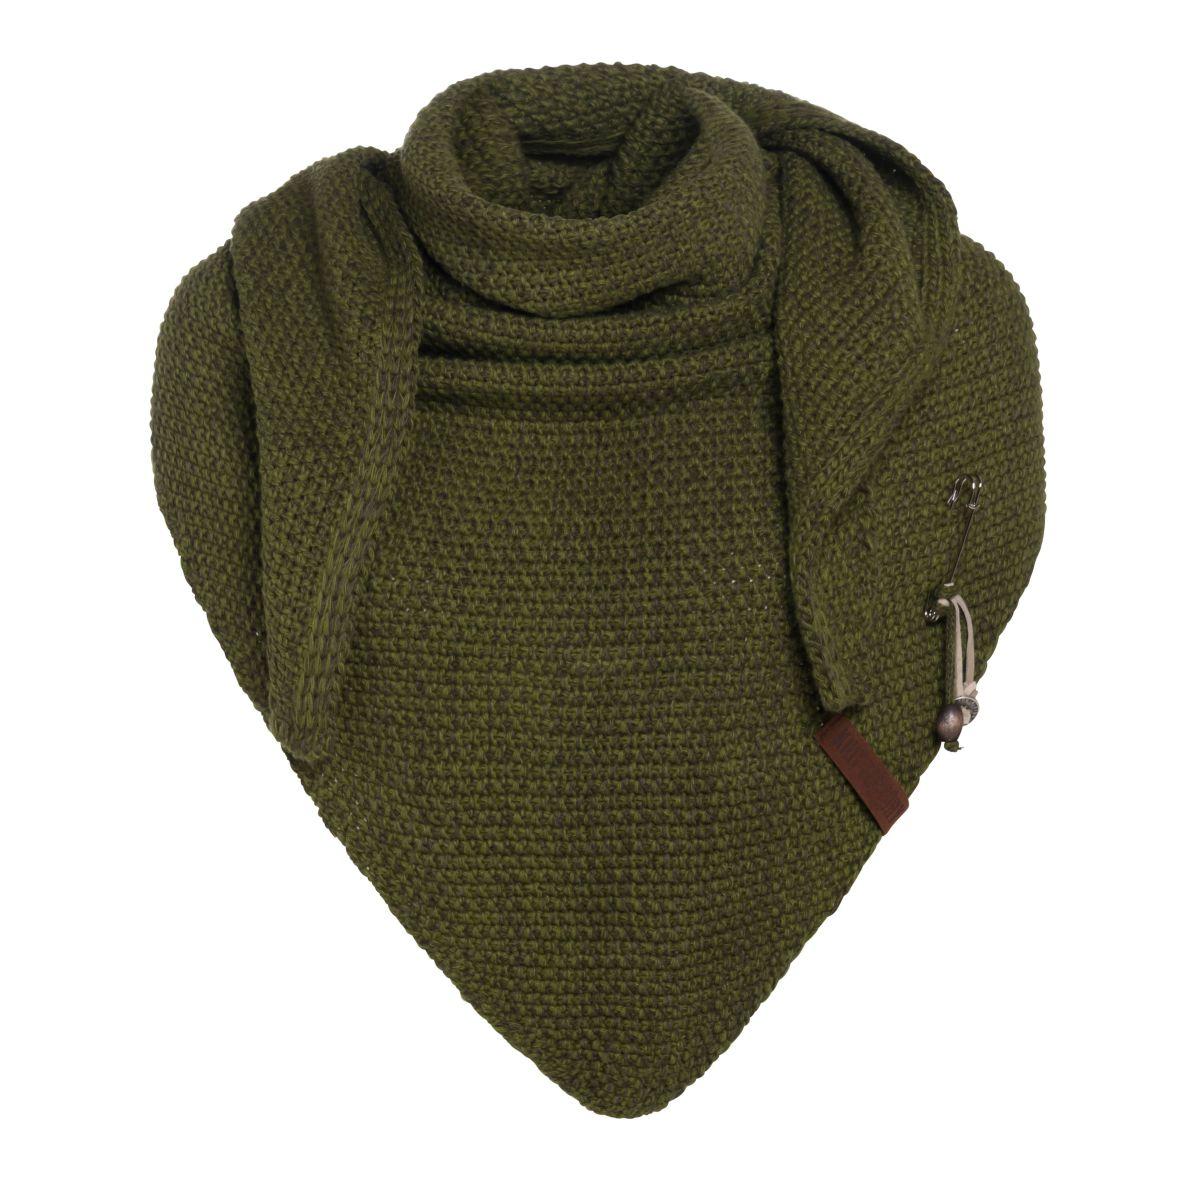 knit factory kf12006008550 coco omslagdoek mosgroen khaki 1